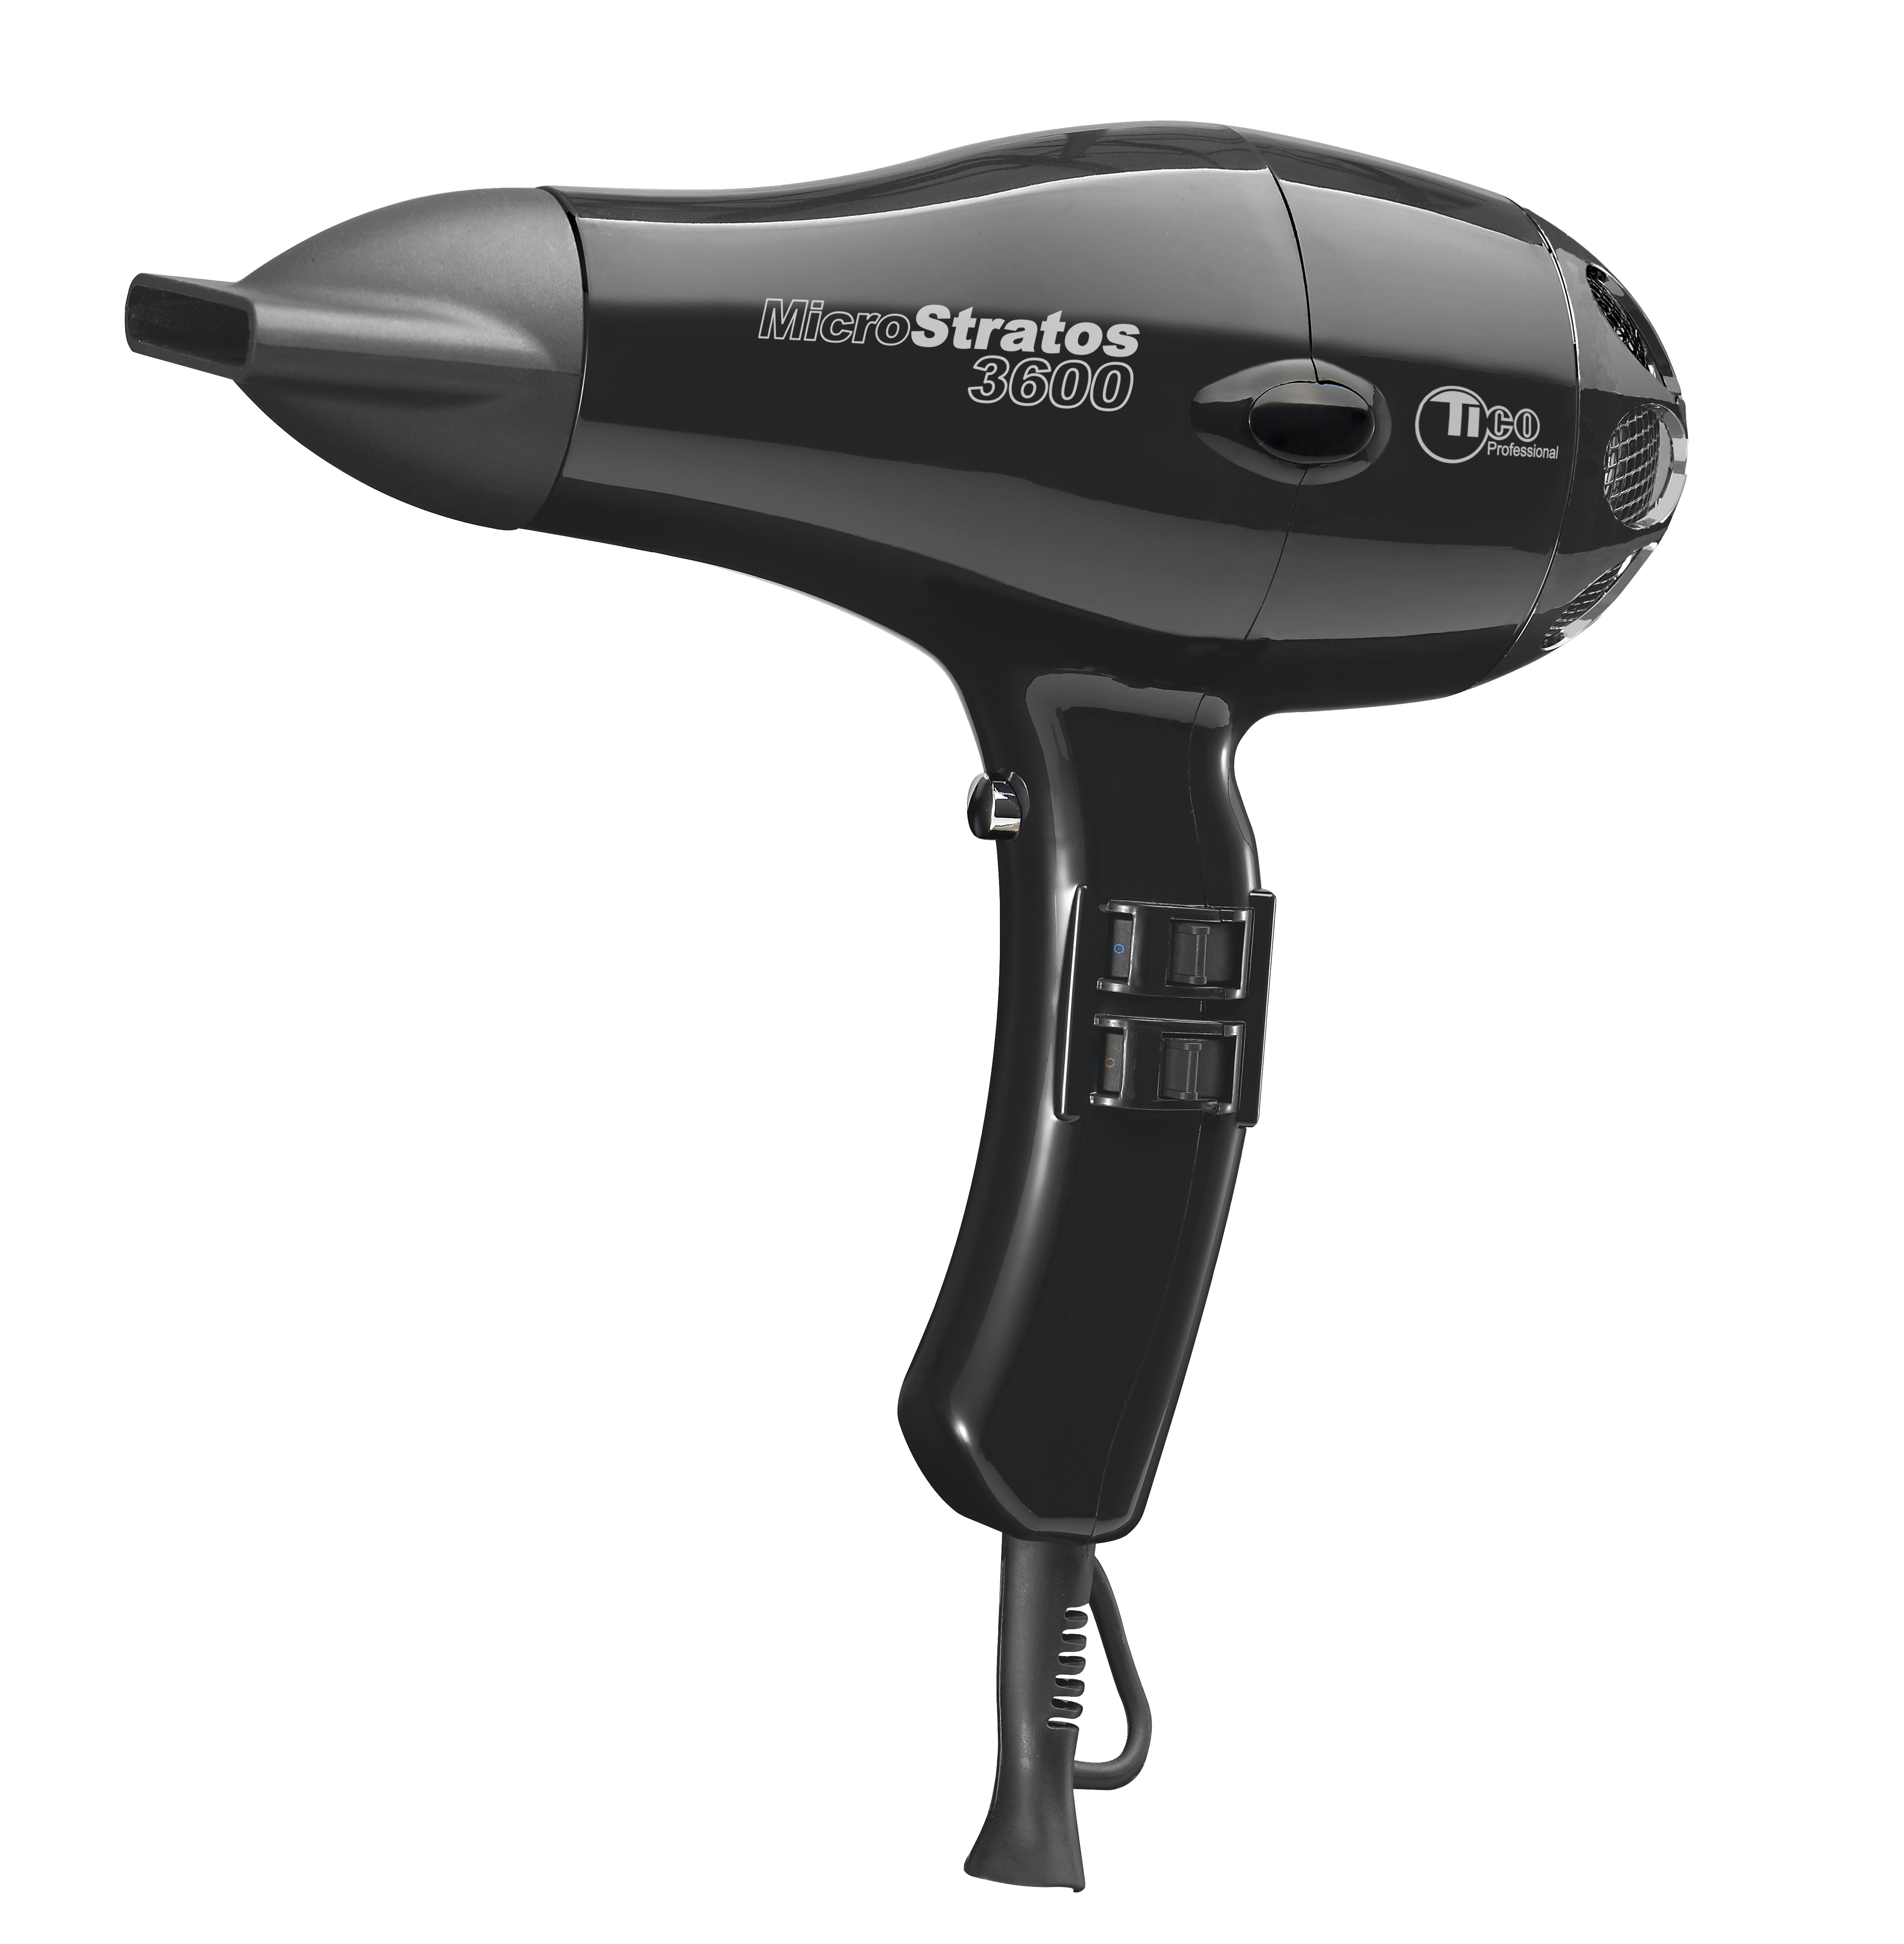 Фен для волос Tico Micro Stratos 3600